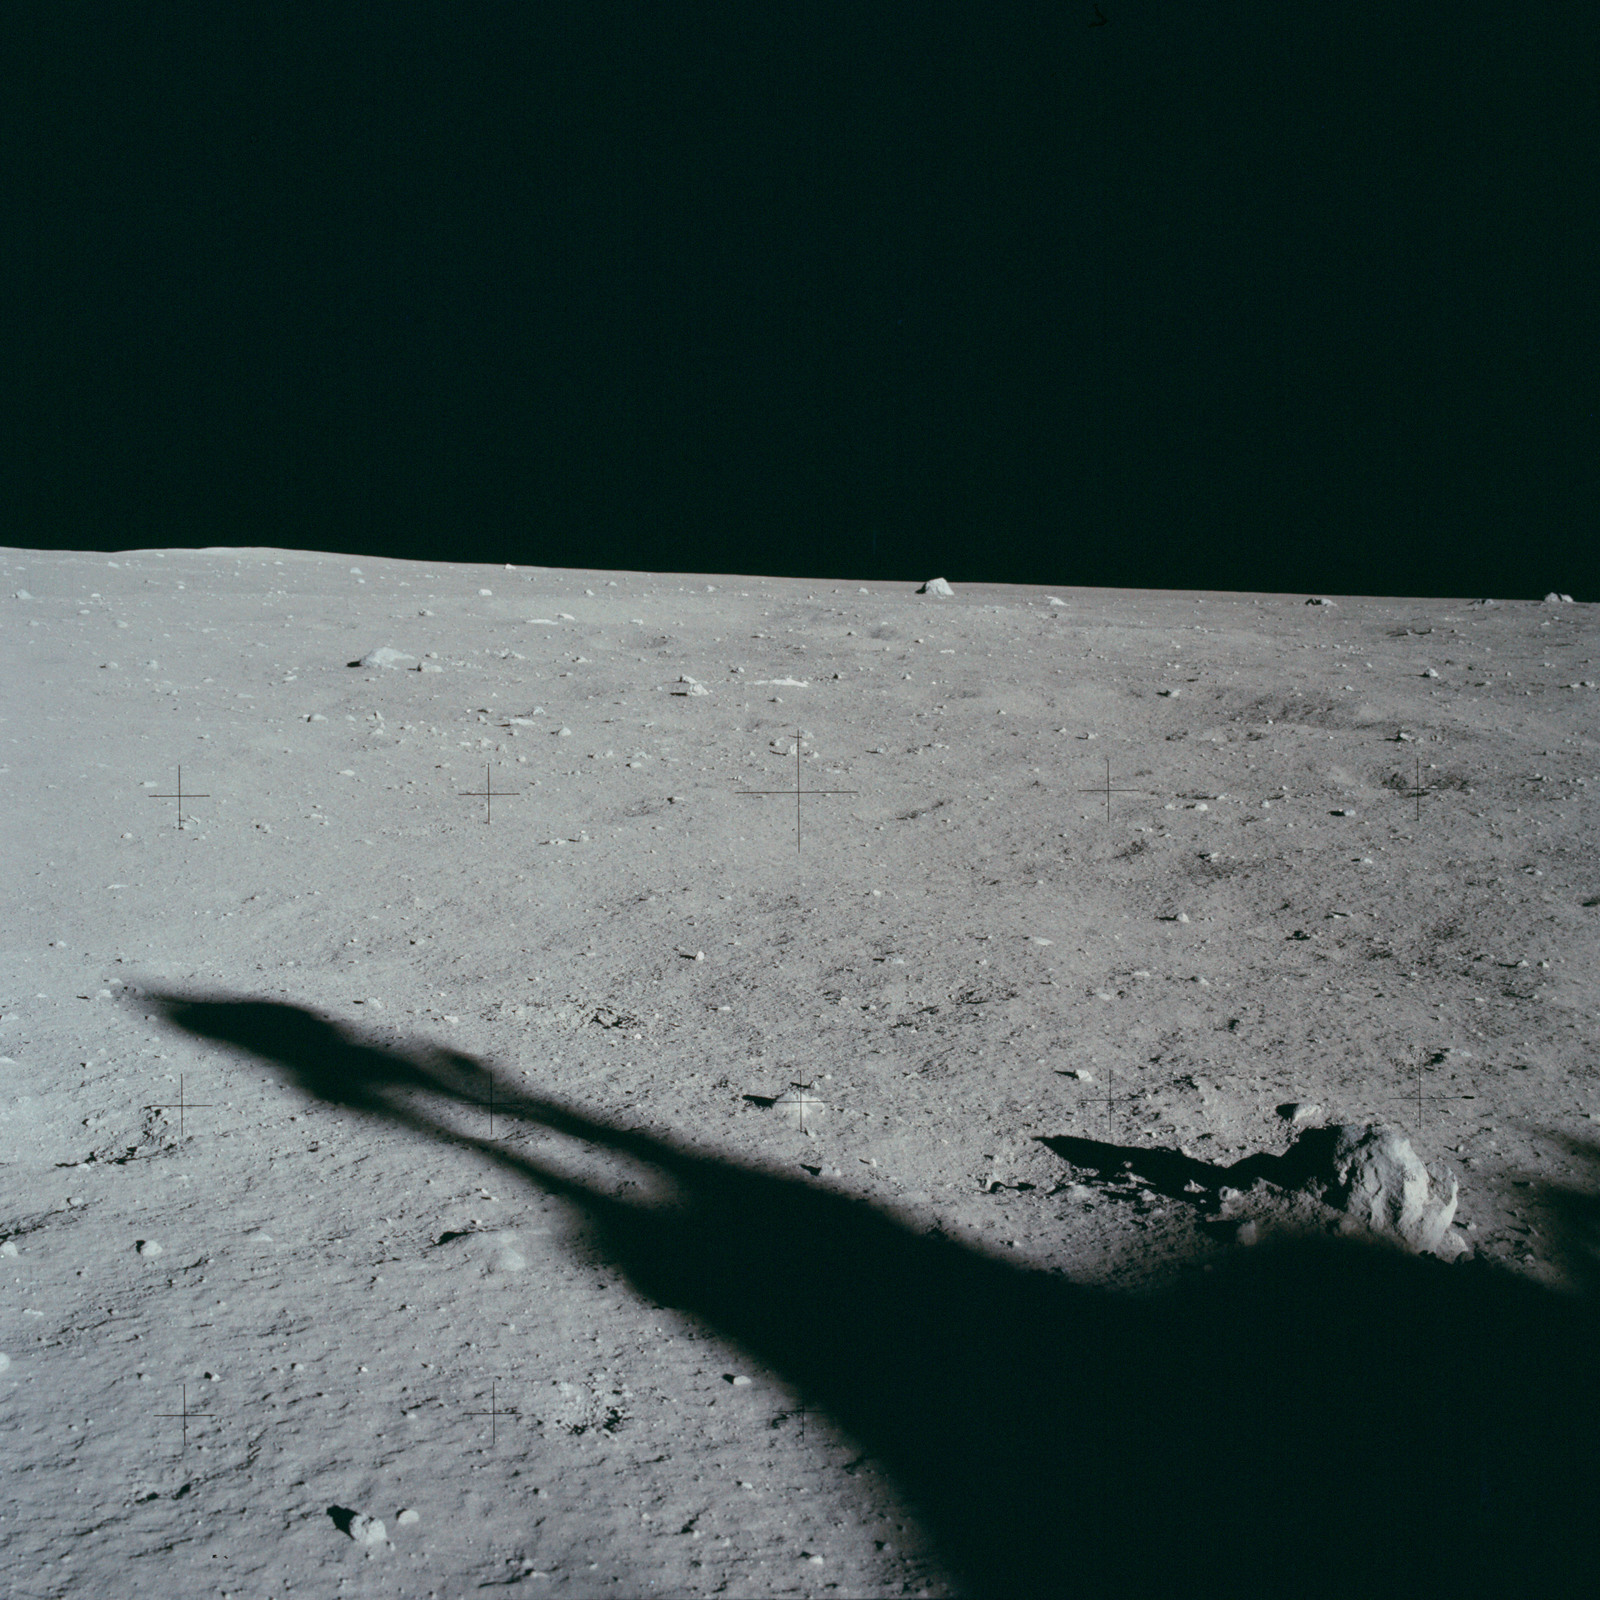 AS11-40-5882A - Apollo 11 - Apollo 11 Mission image - Lunar surface and horizon